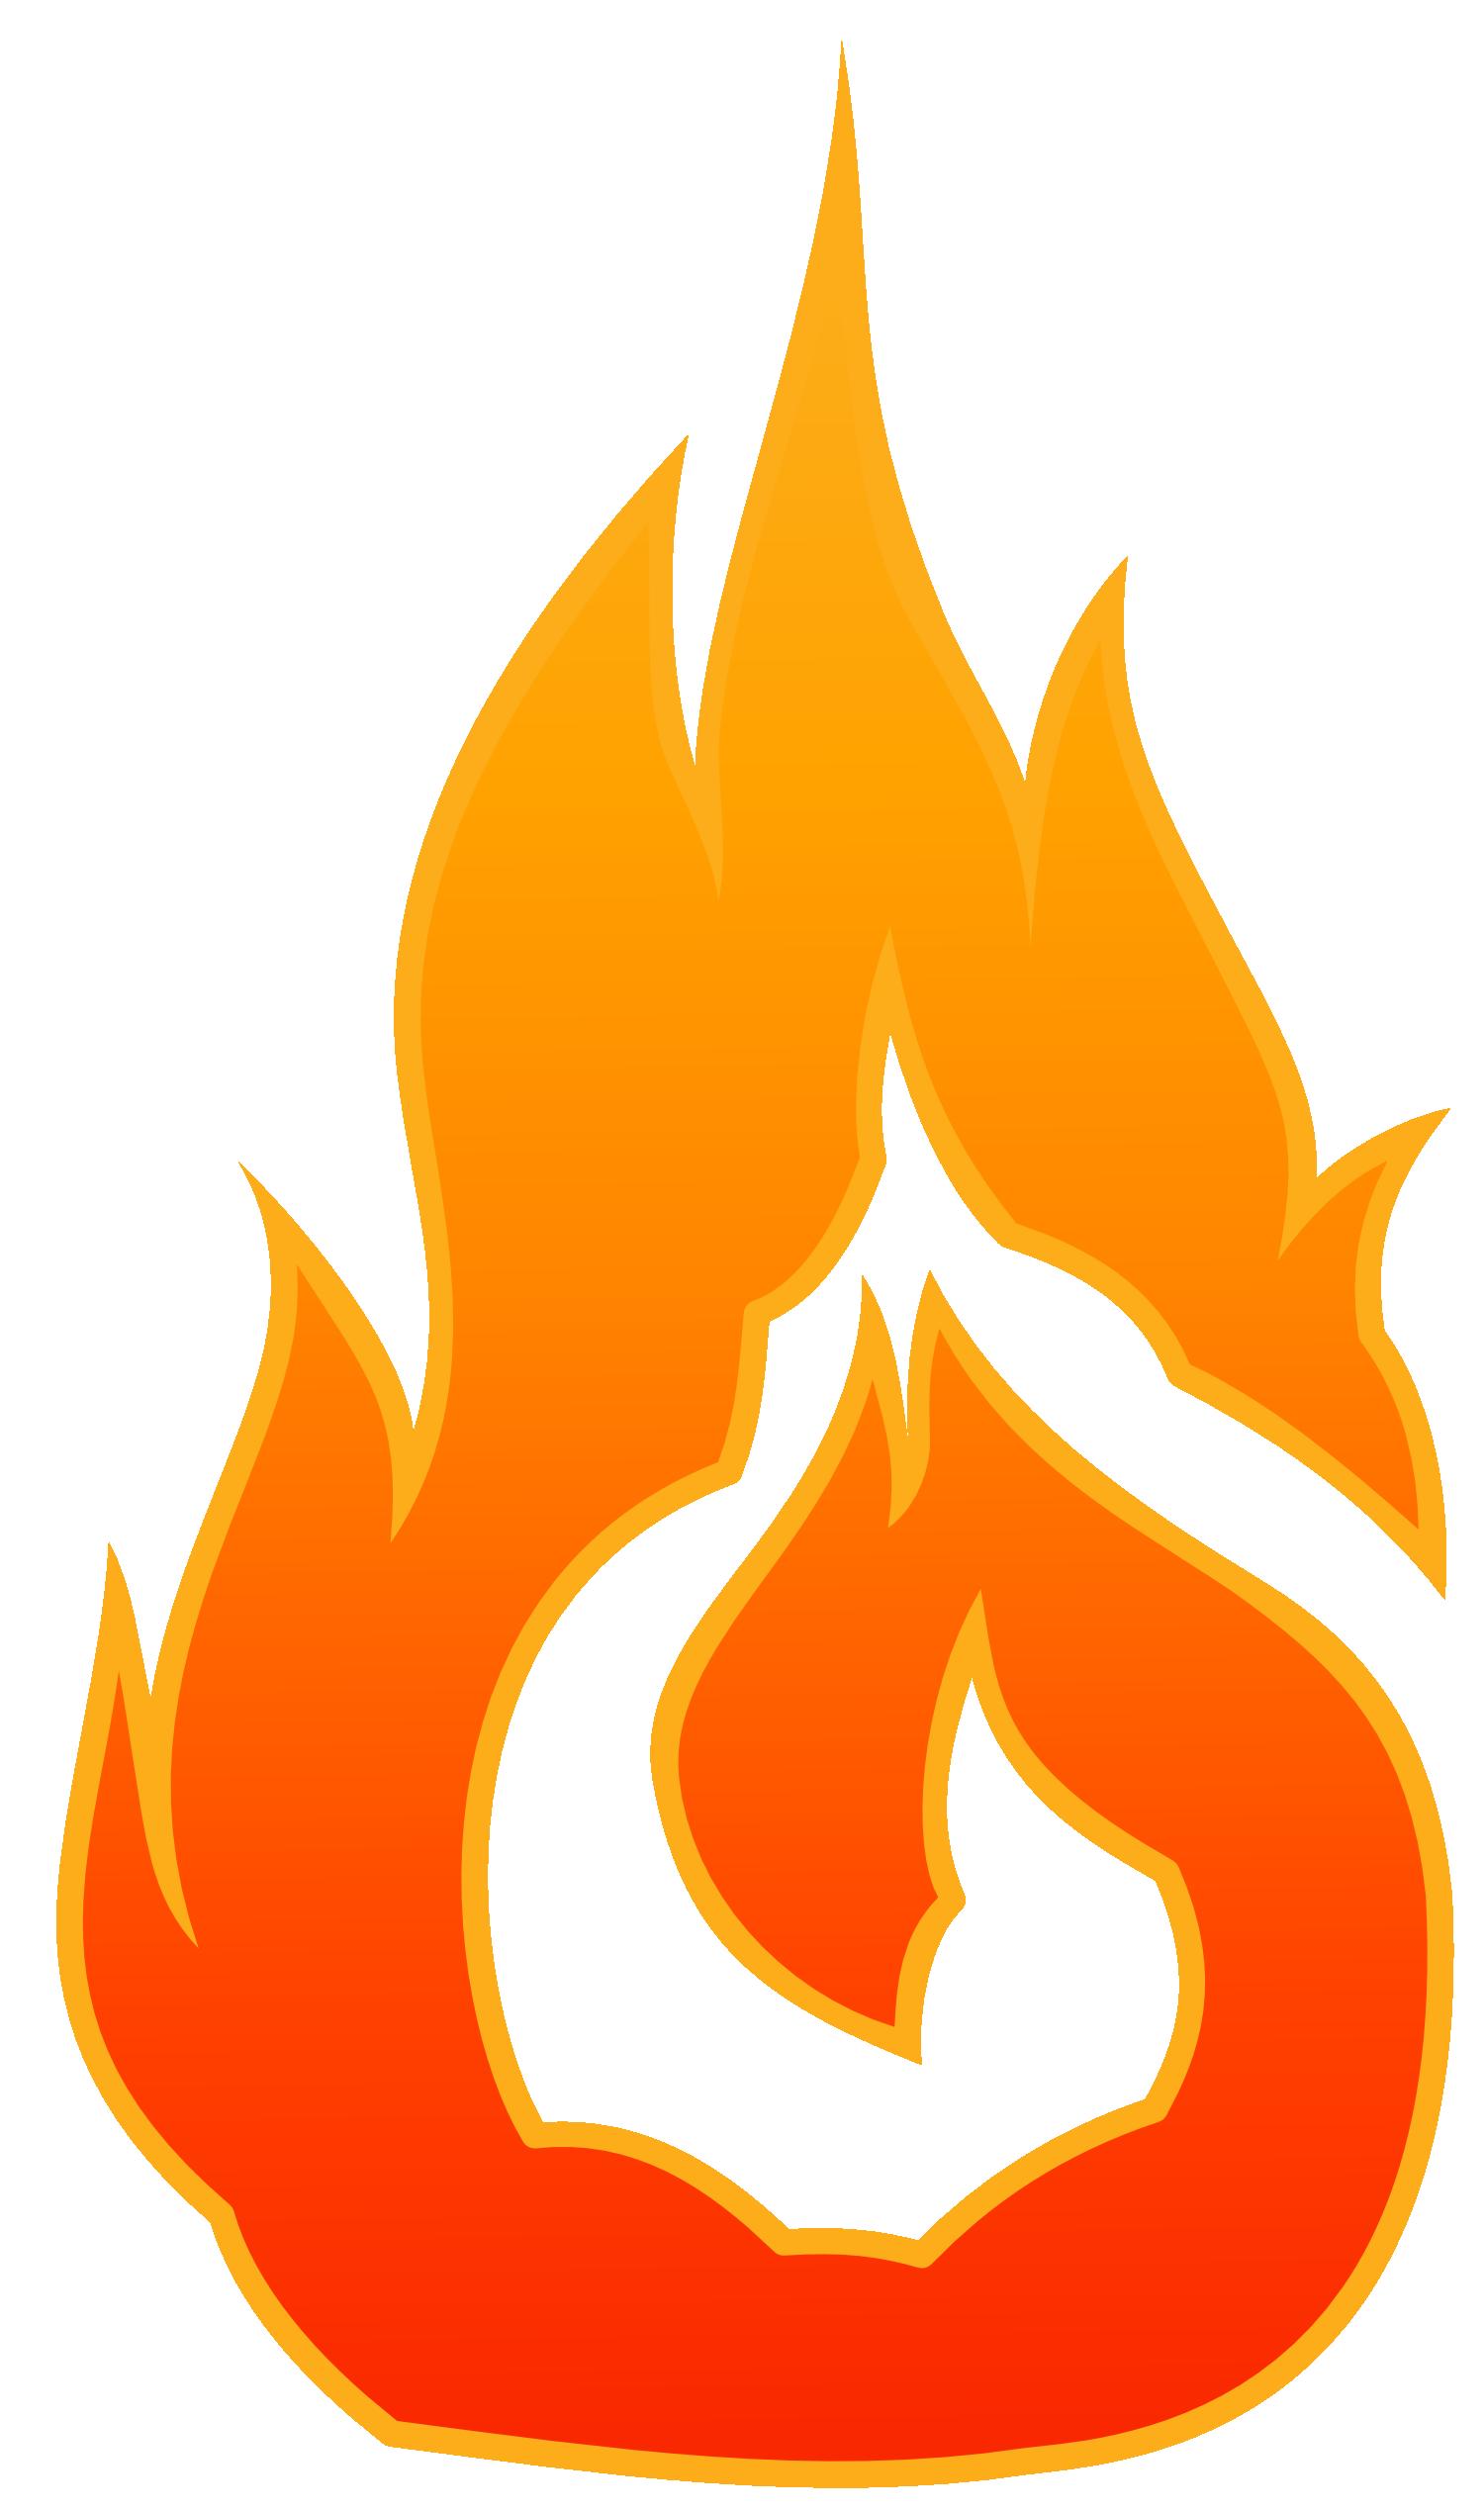 fire cutie marks - photo #4